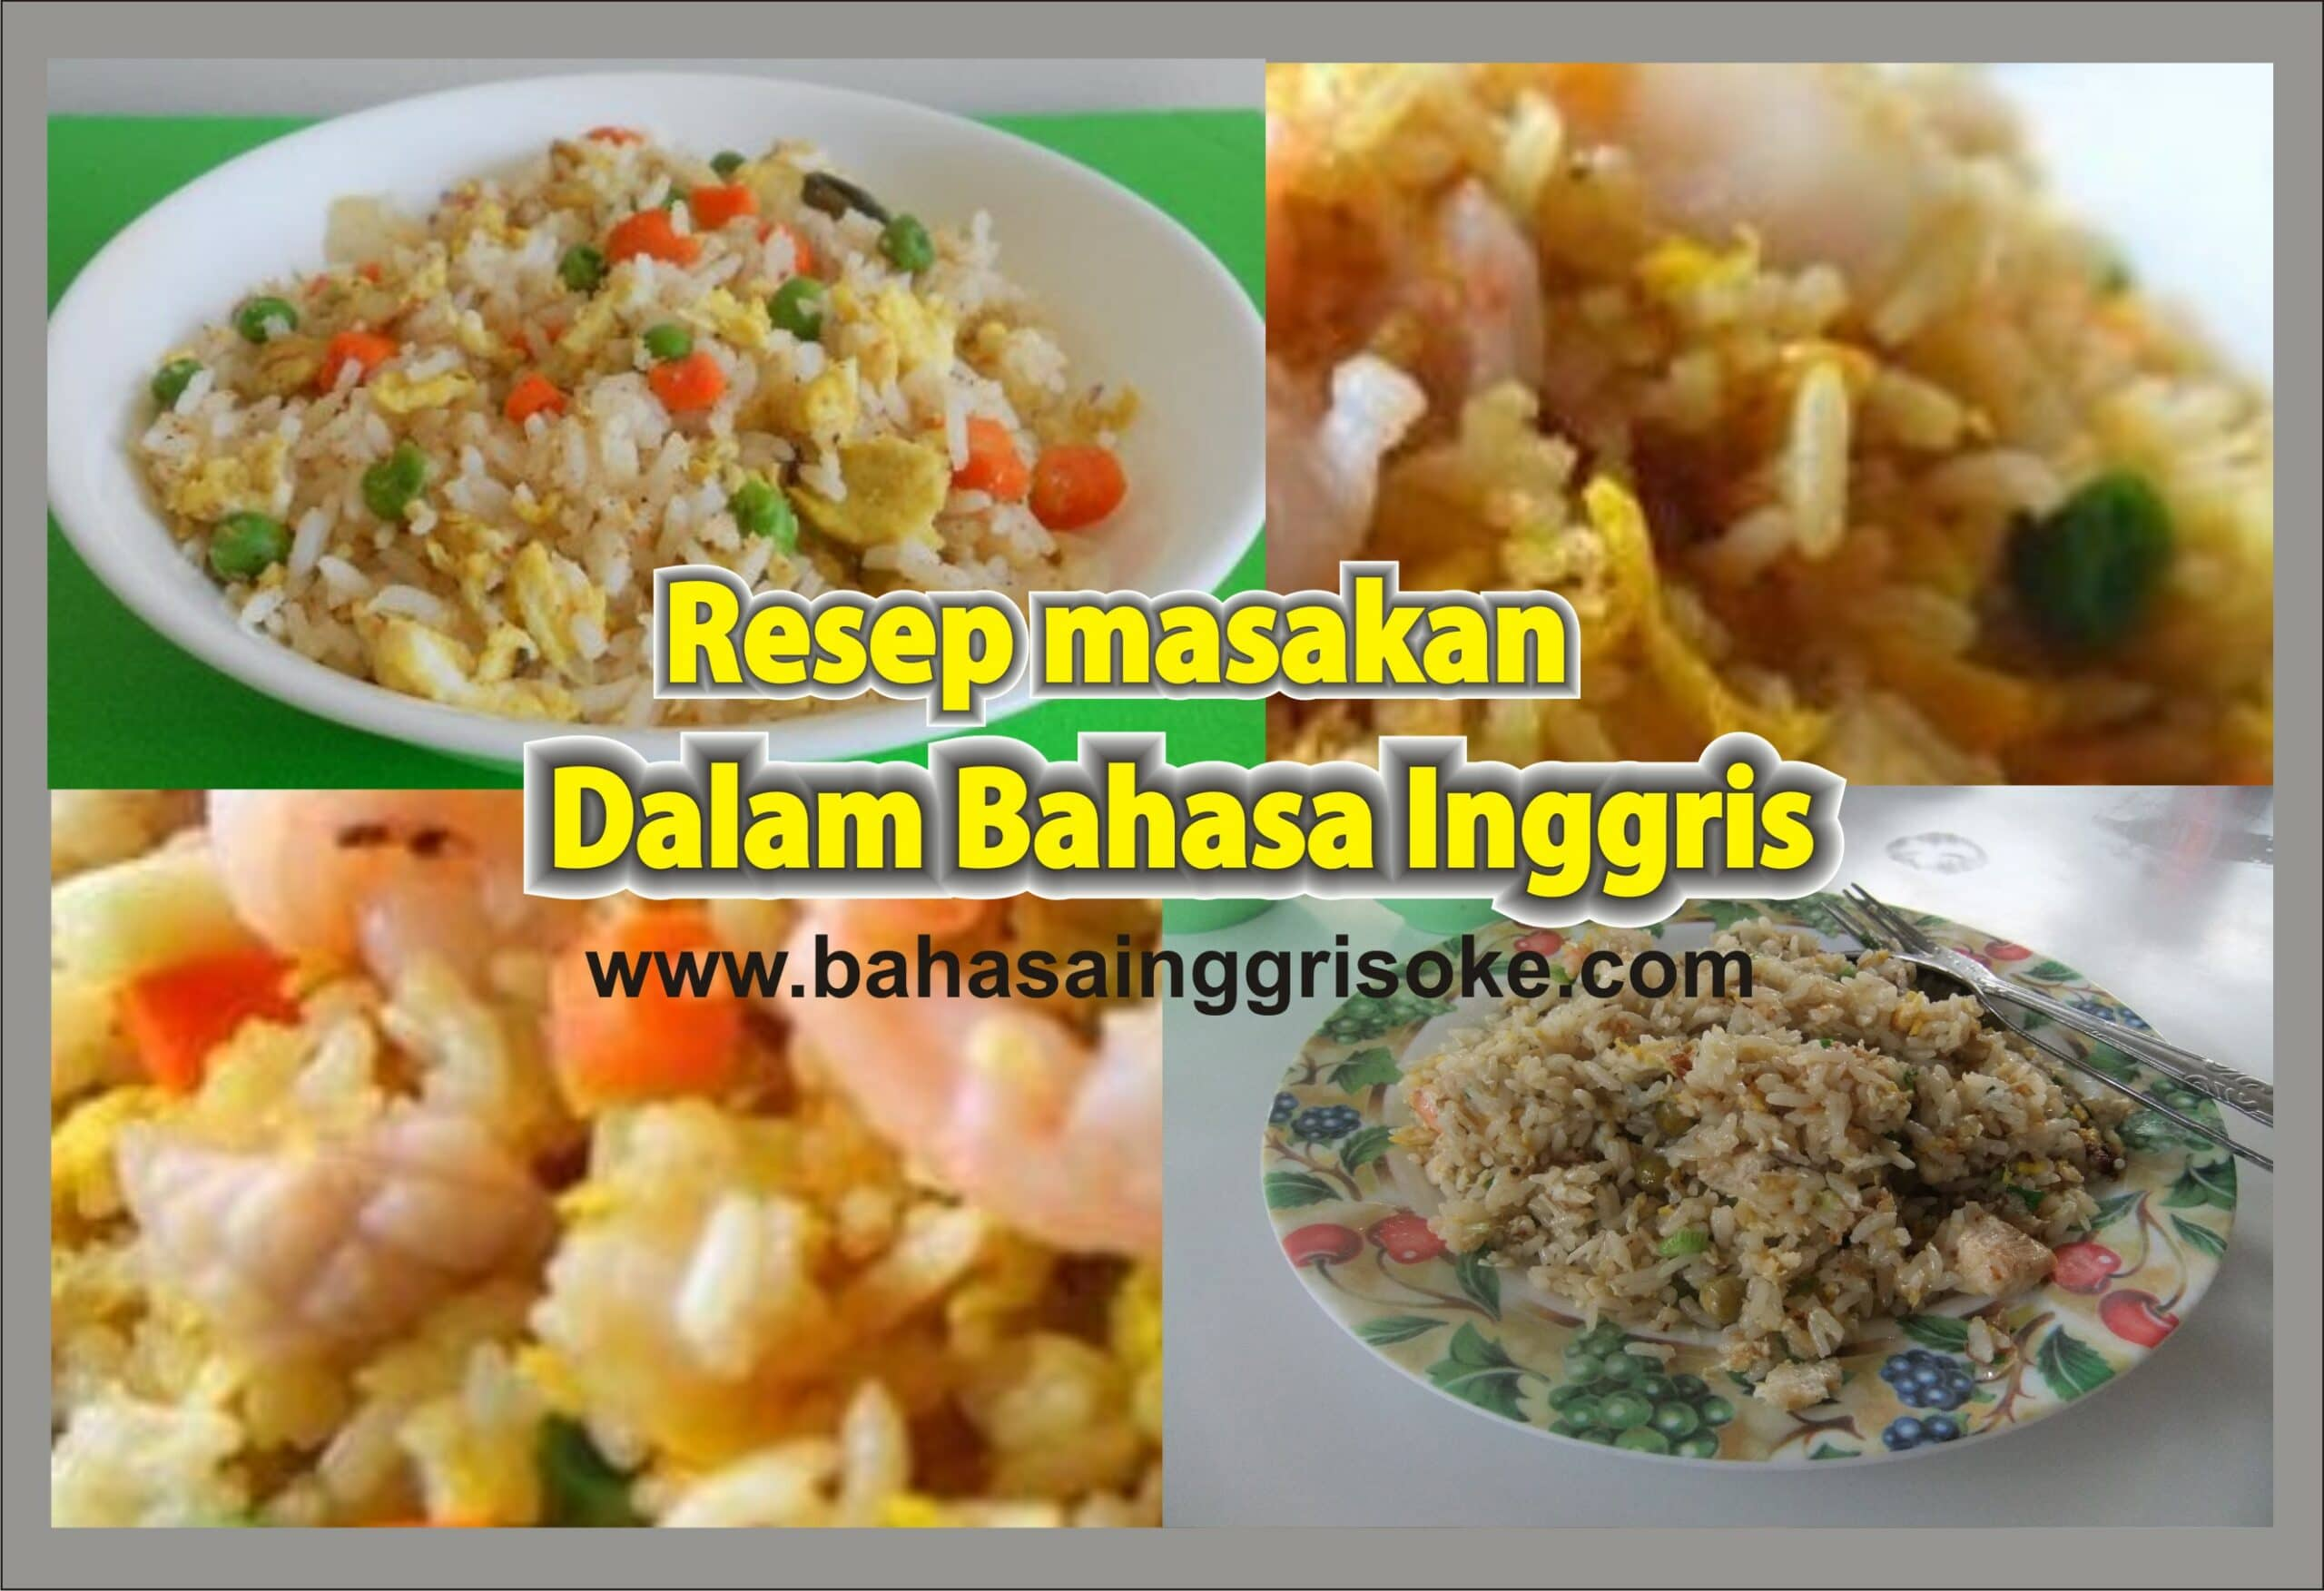 Kumpulan Koleksi Resep Makanan Dalam Bahasa Inggris Terbaru Dan Terlengkap Bukuinggris Co Id